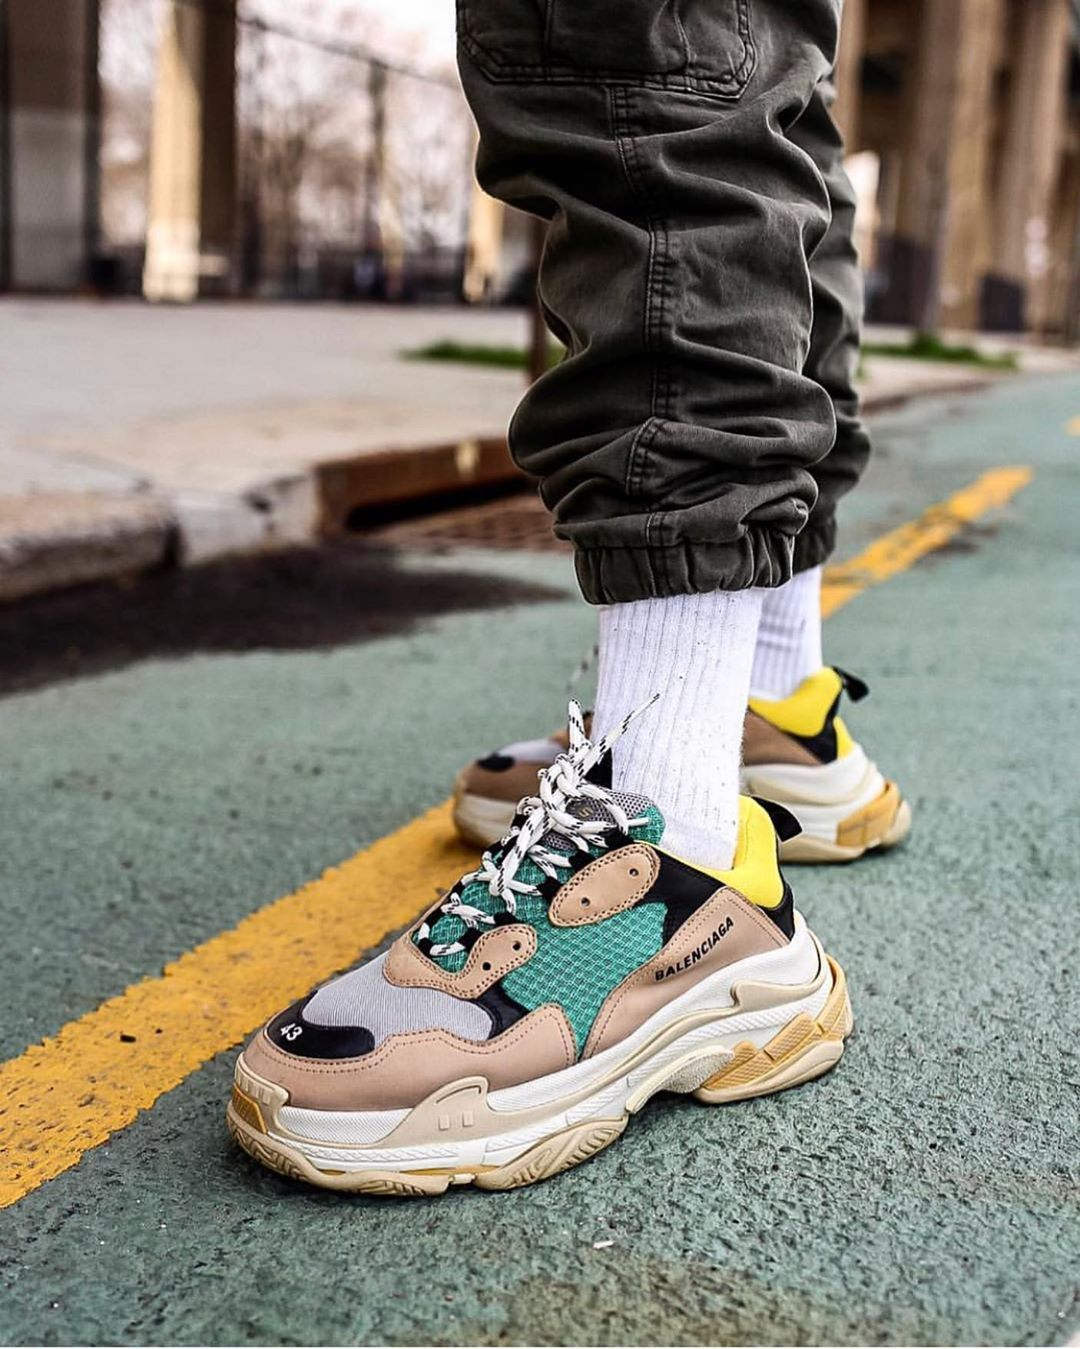 Pin by Shop Supernova on Sneakers Foot locker, Sneakers